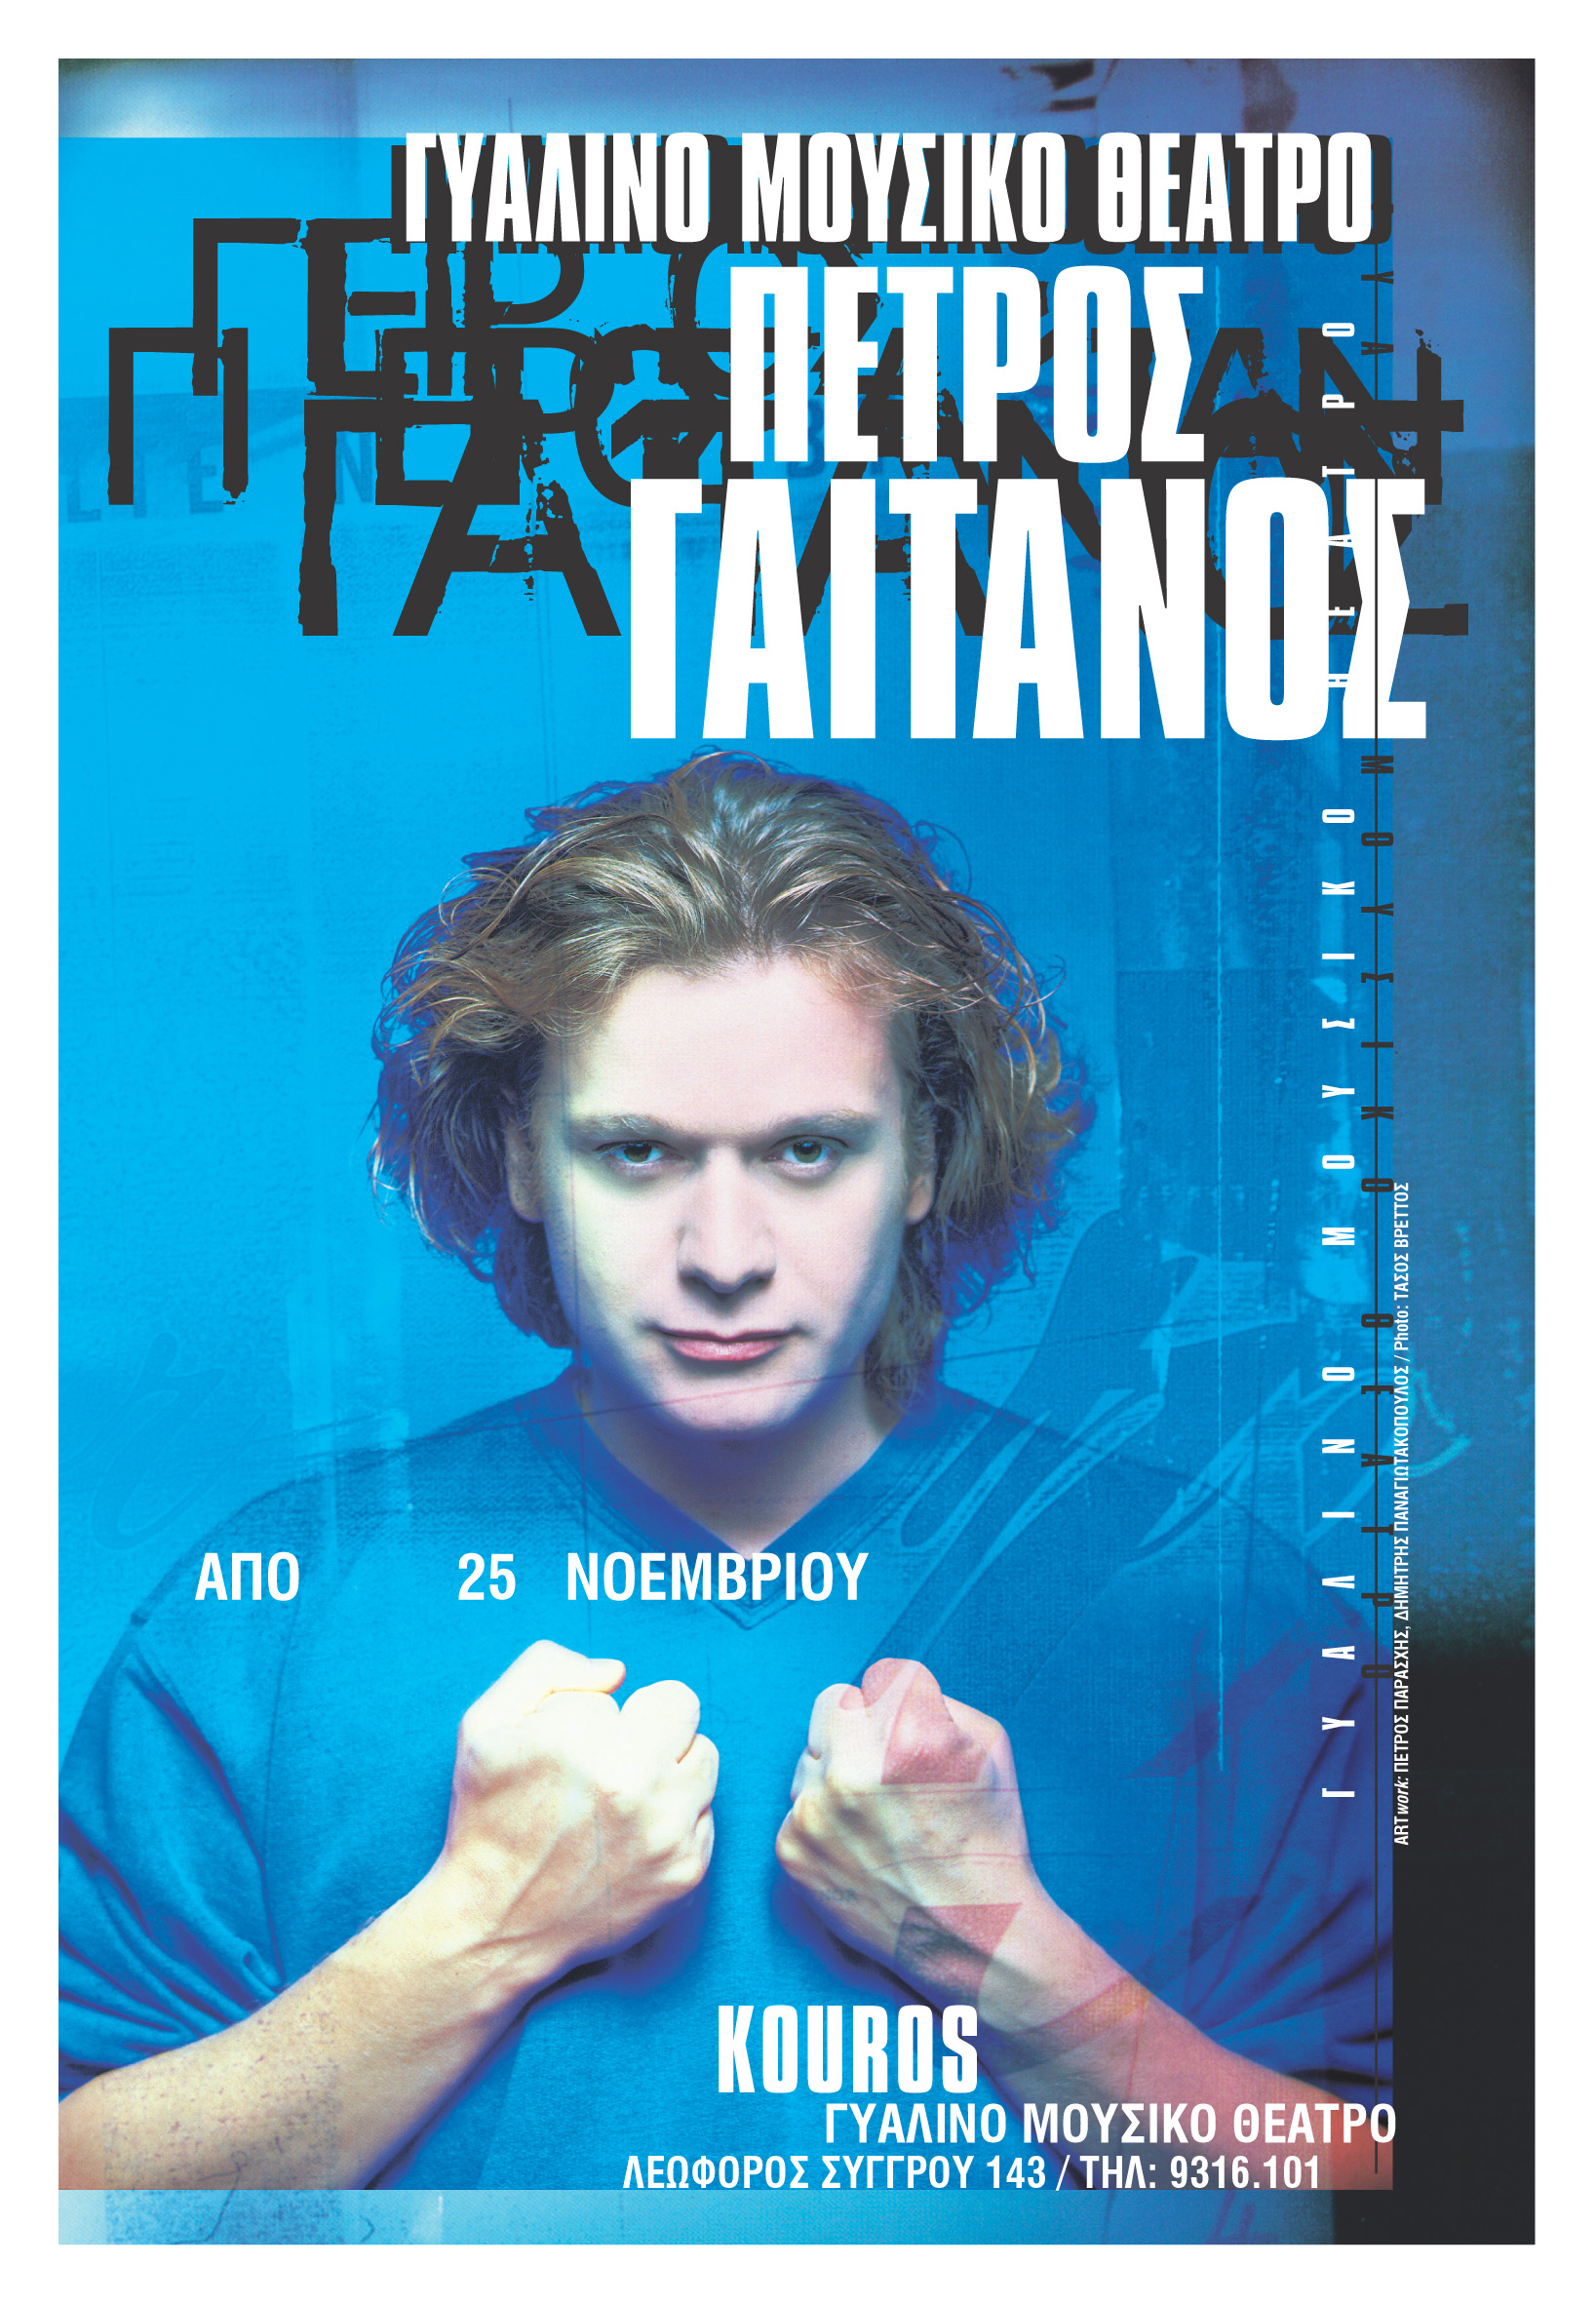 gialino MUSIKO THEATRO 1998